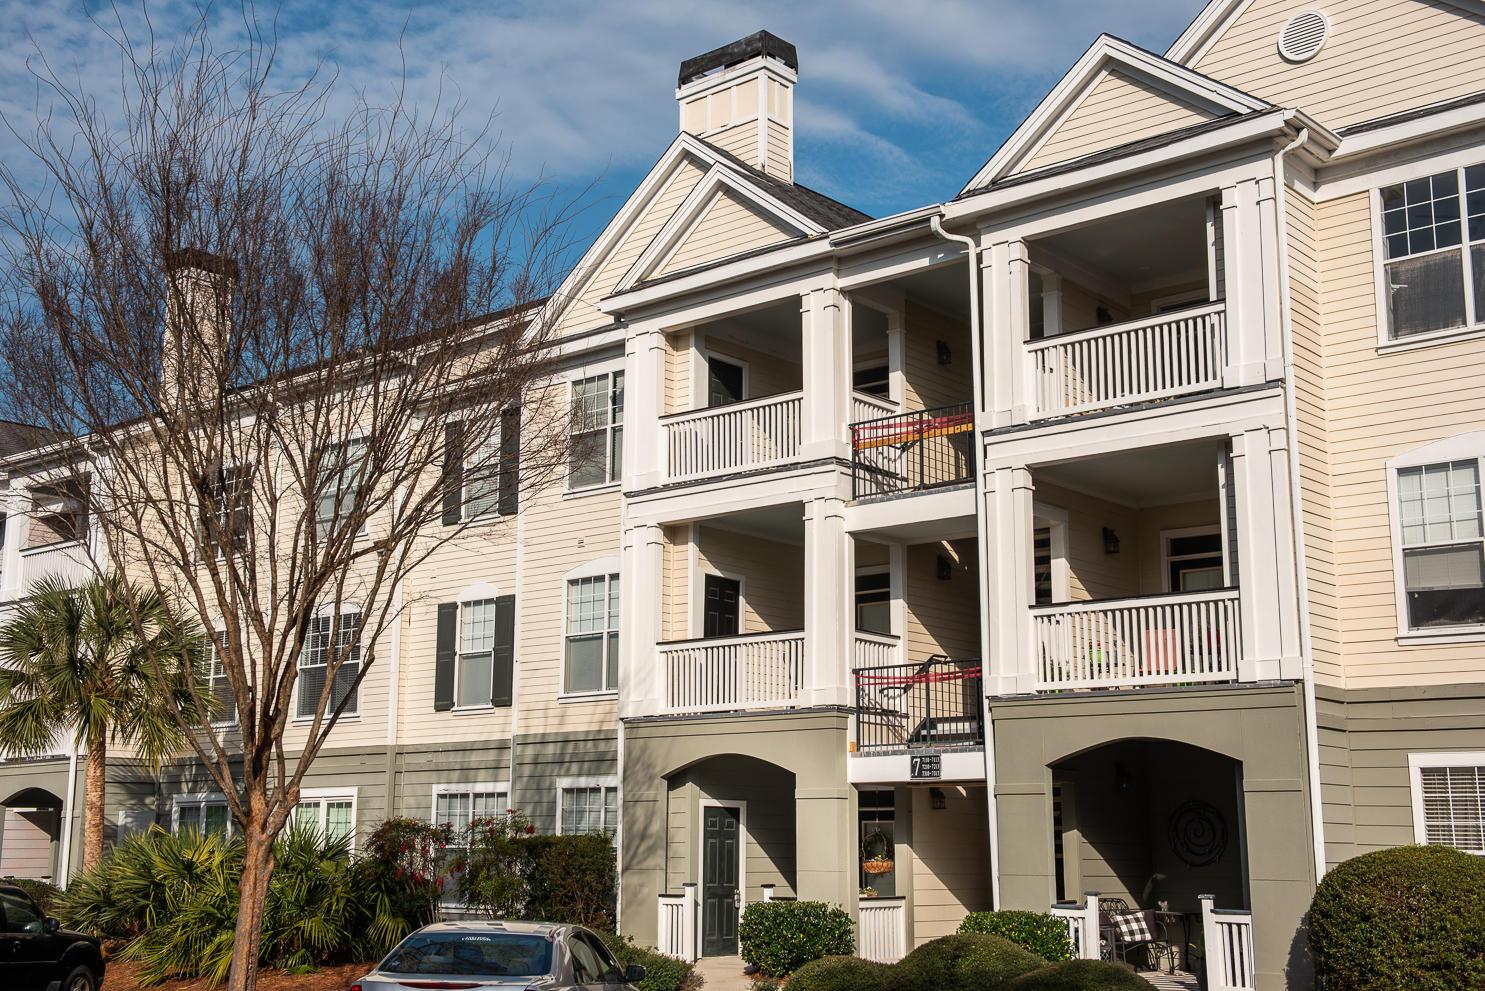 Daniel Landing Condos Homes For Sale - 130 River Landing, Charleston, SC - 15